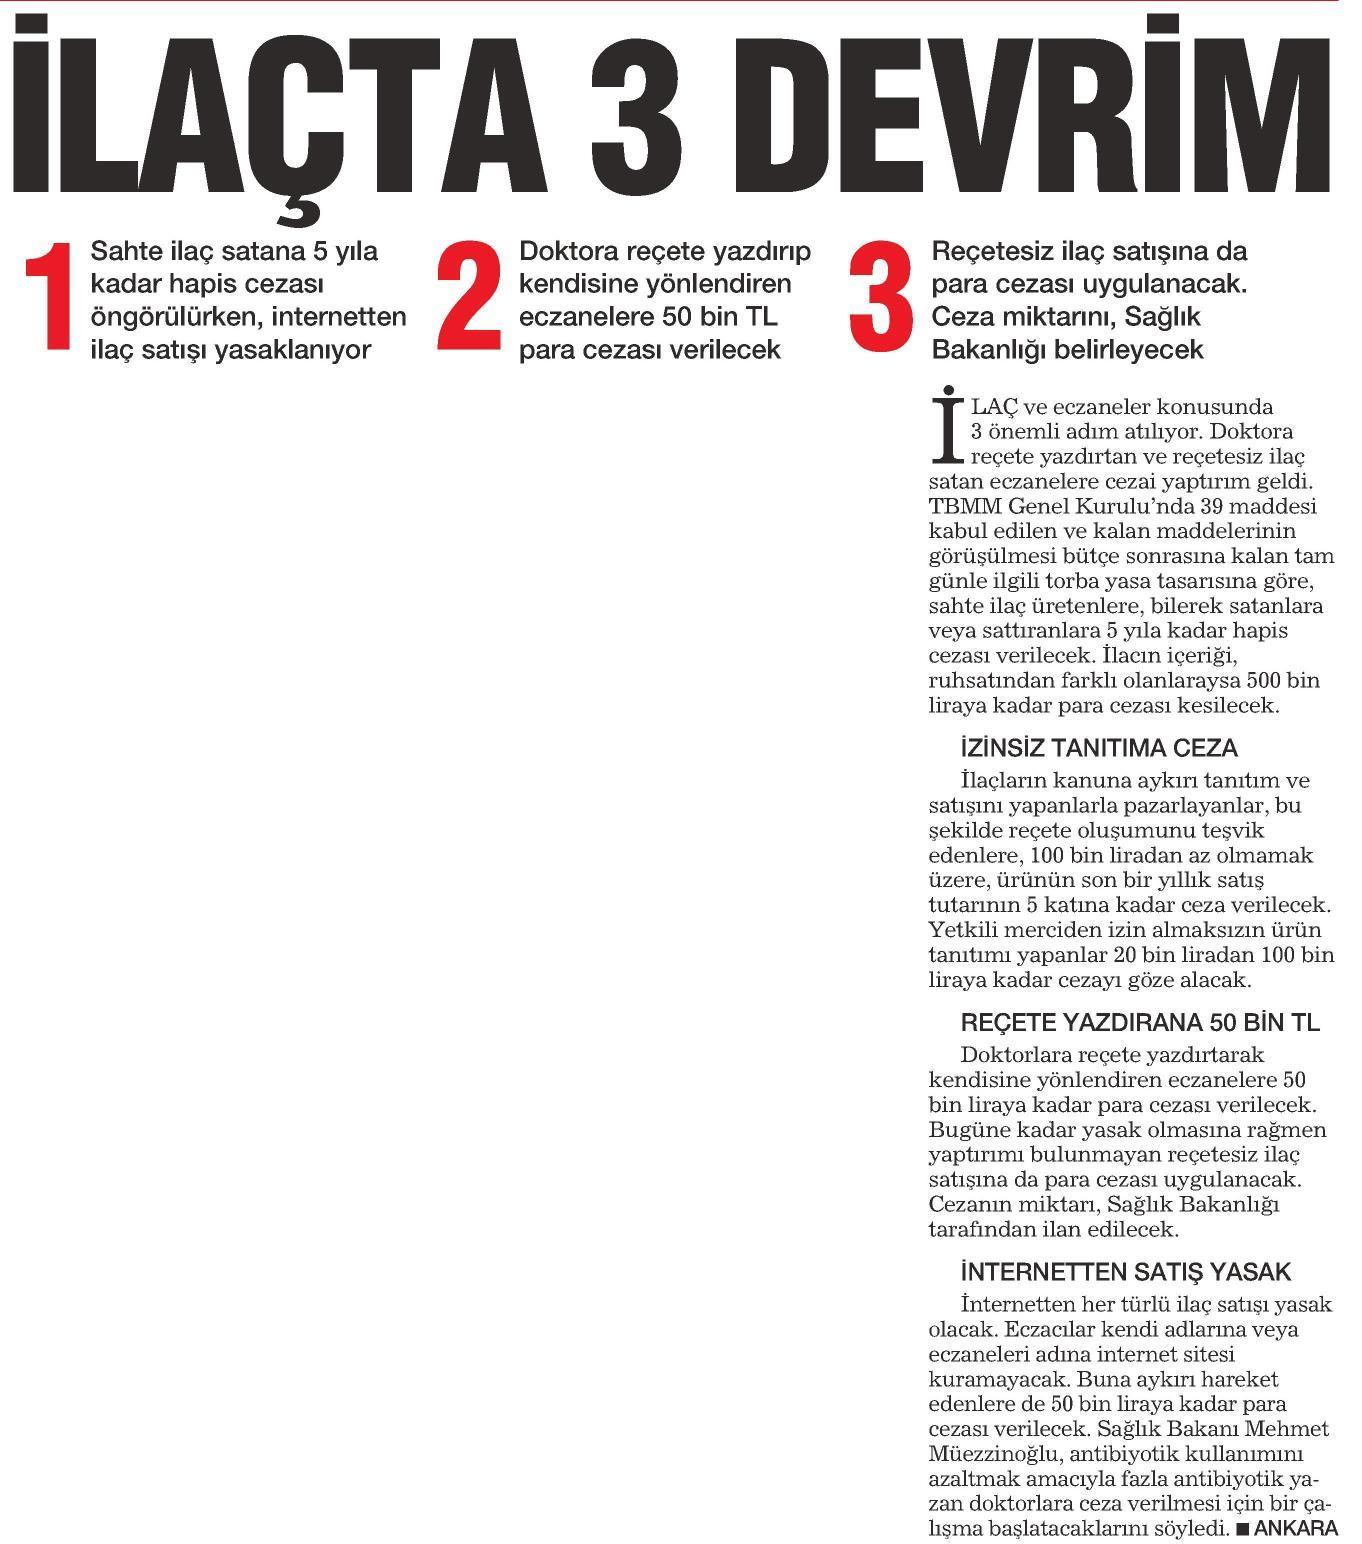 torba-yasada-3-ilac-devrimi-13-12-2013-27122018173851